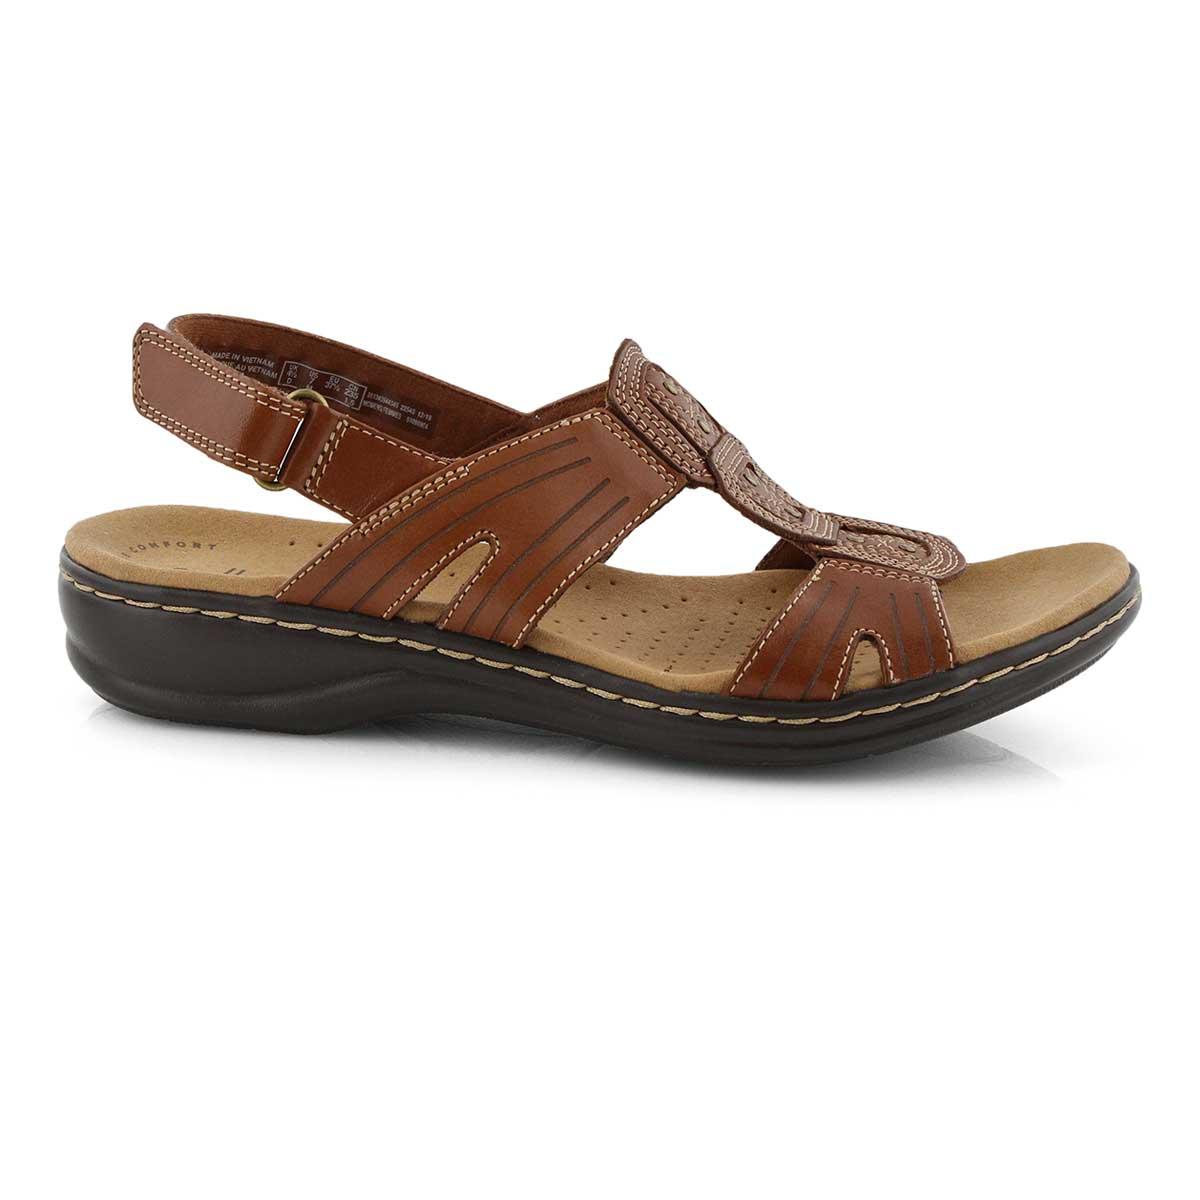 Lds Leisa Vine dark tan casual sandal